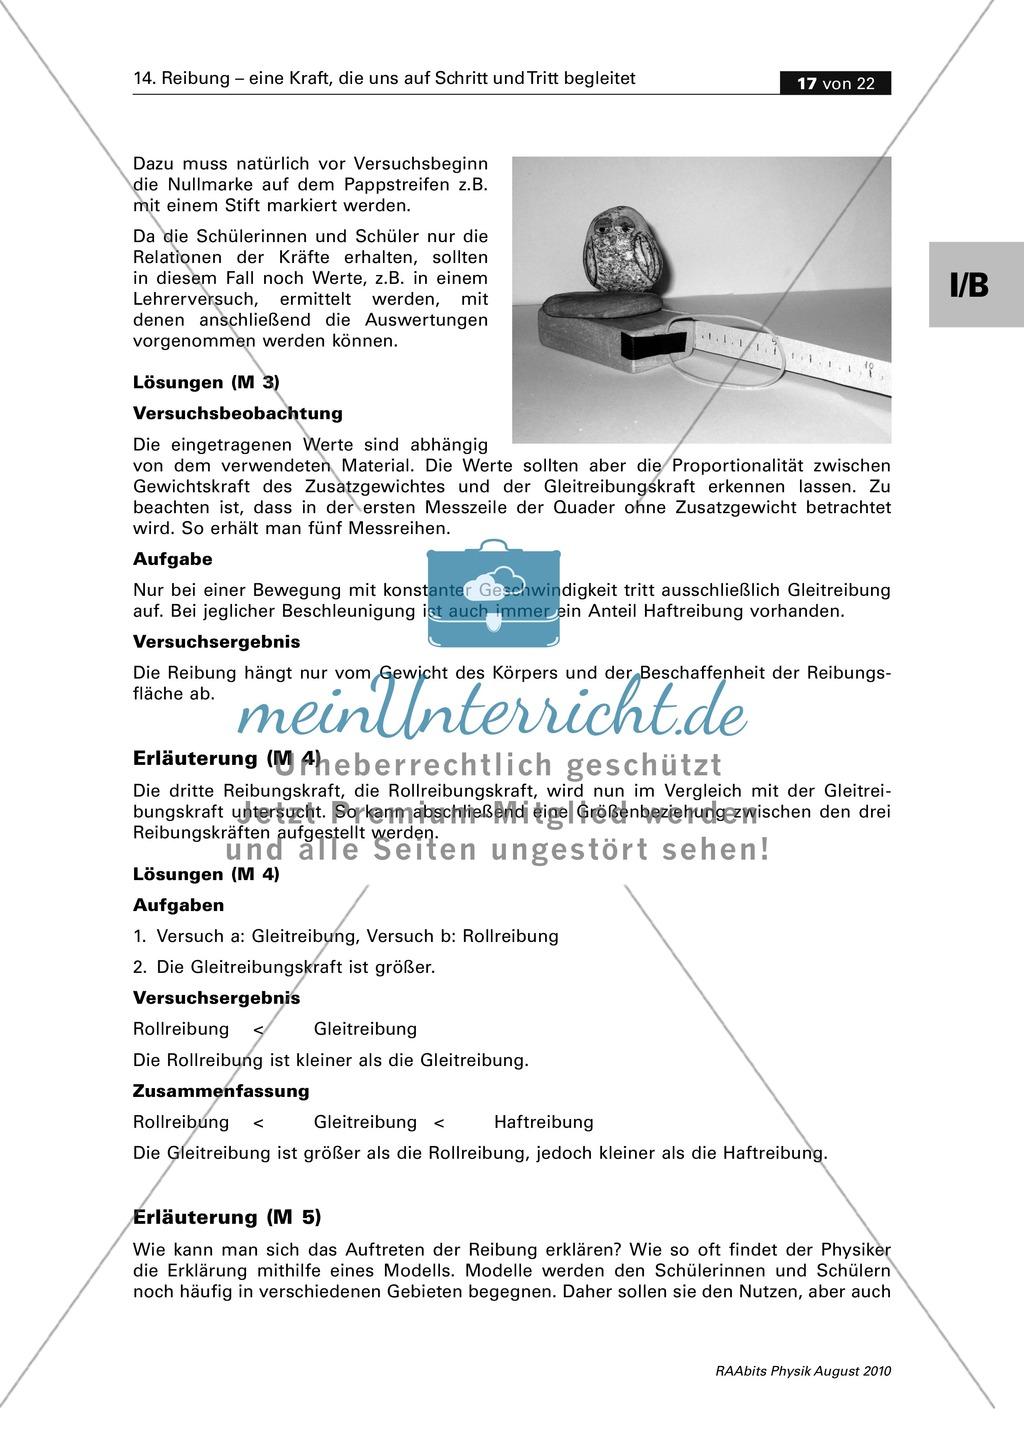 Luxury Arbeitsblatt Reibung Festooning - Kindergarten Arbeitsblatt ...